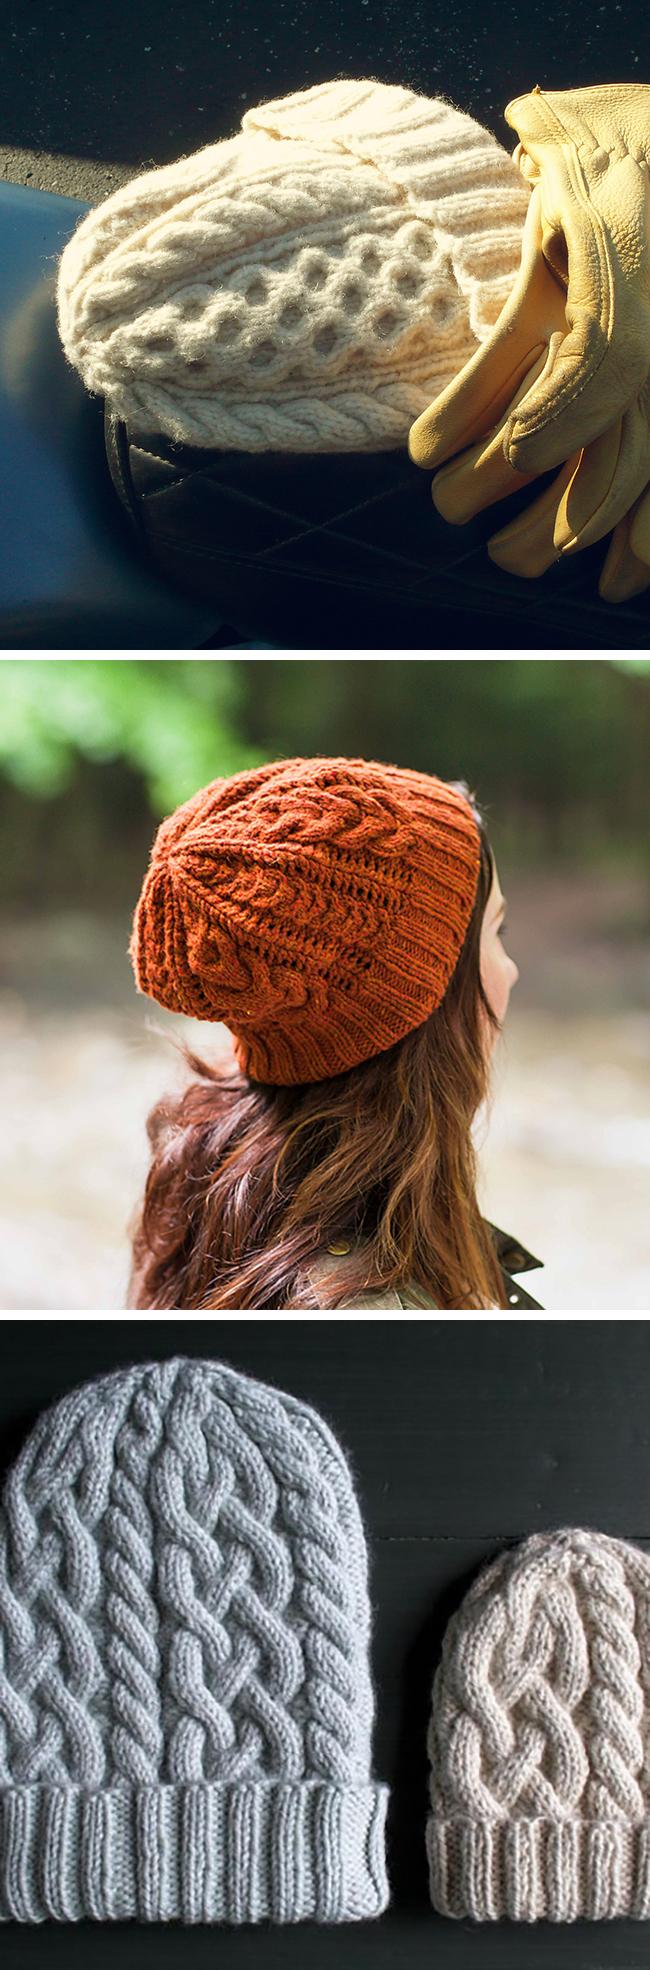 New Favorites: Aran-style hats